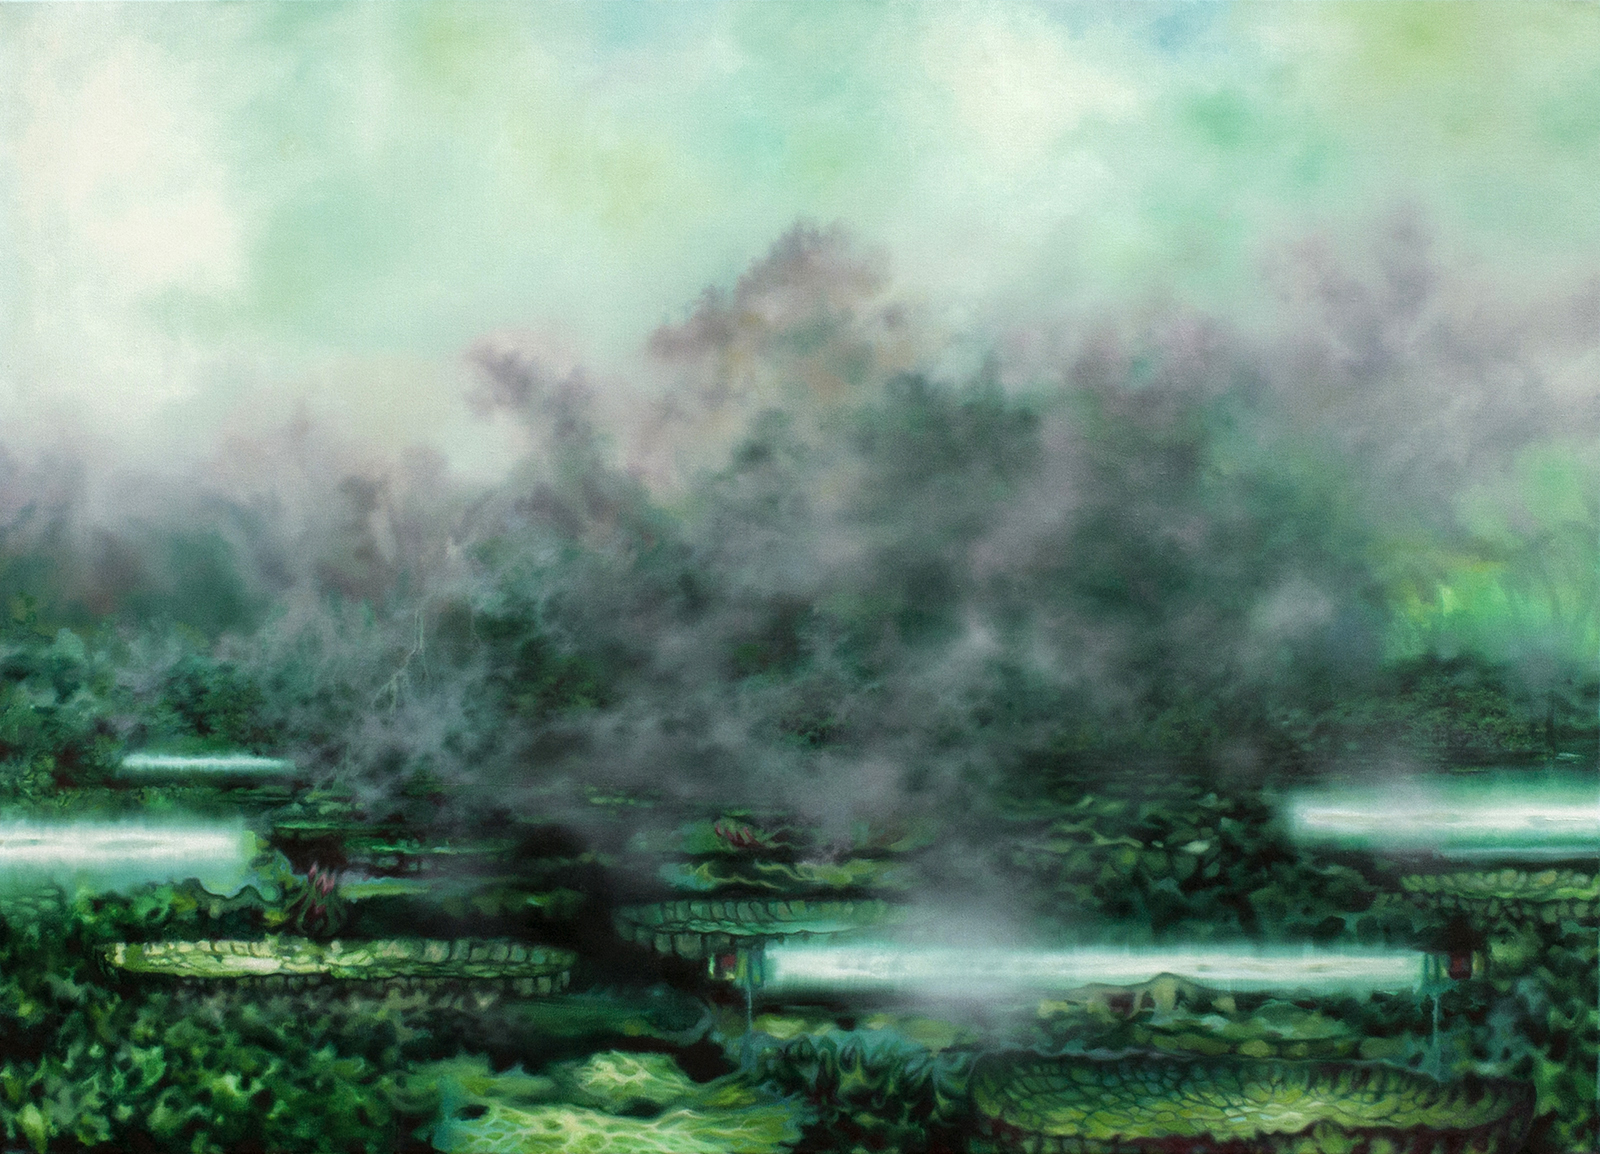 Labor der Natur 2017, 100 x 140 cm, Öl auf Leinwand  Laboratory of Nature 2017, 100 x 140 cm, oil on canvas